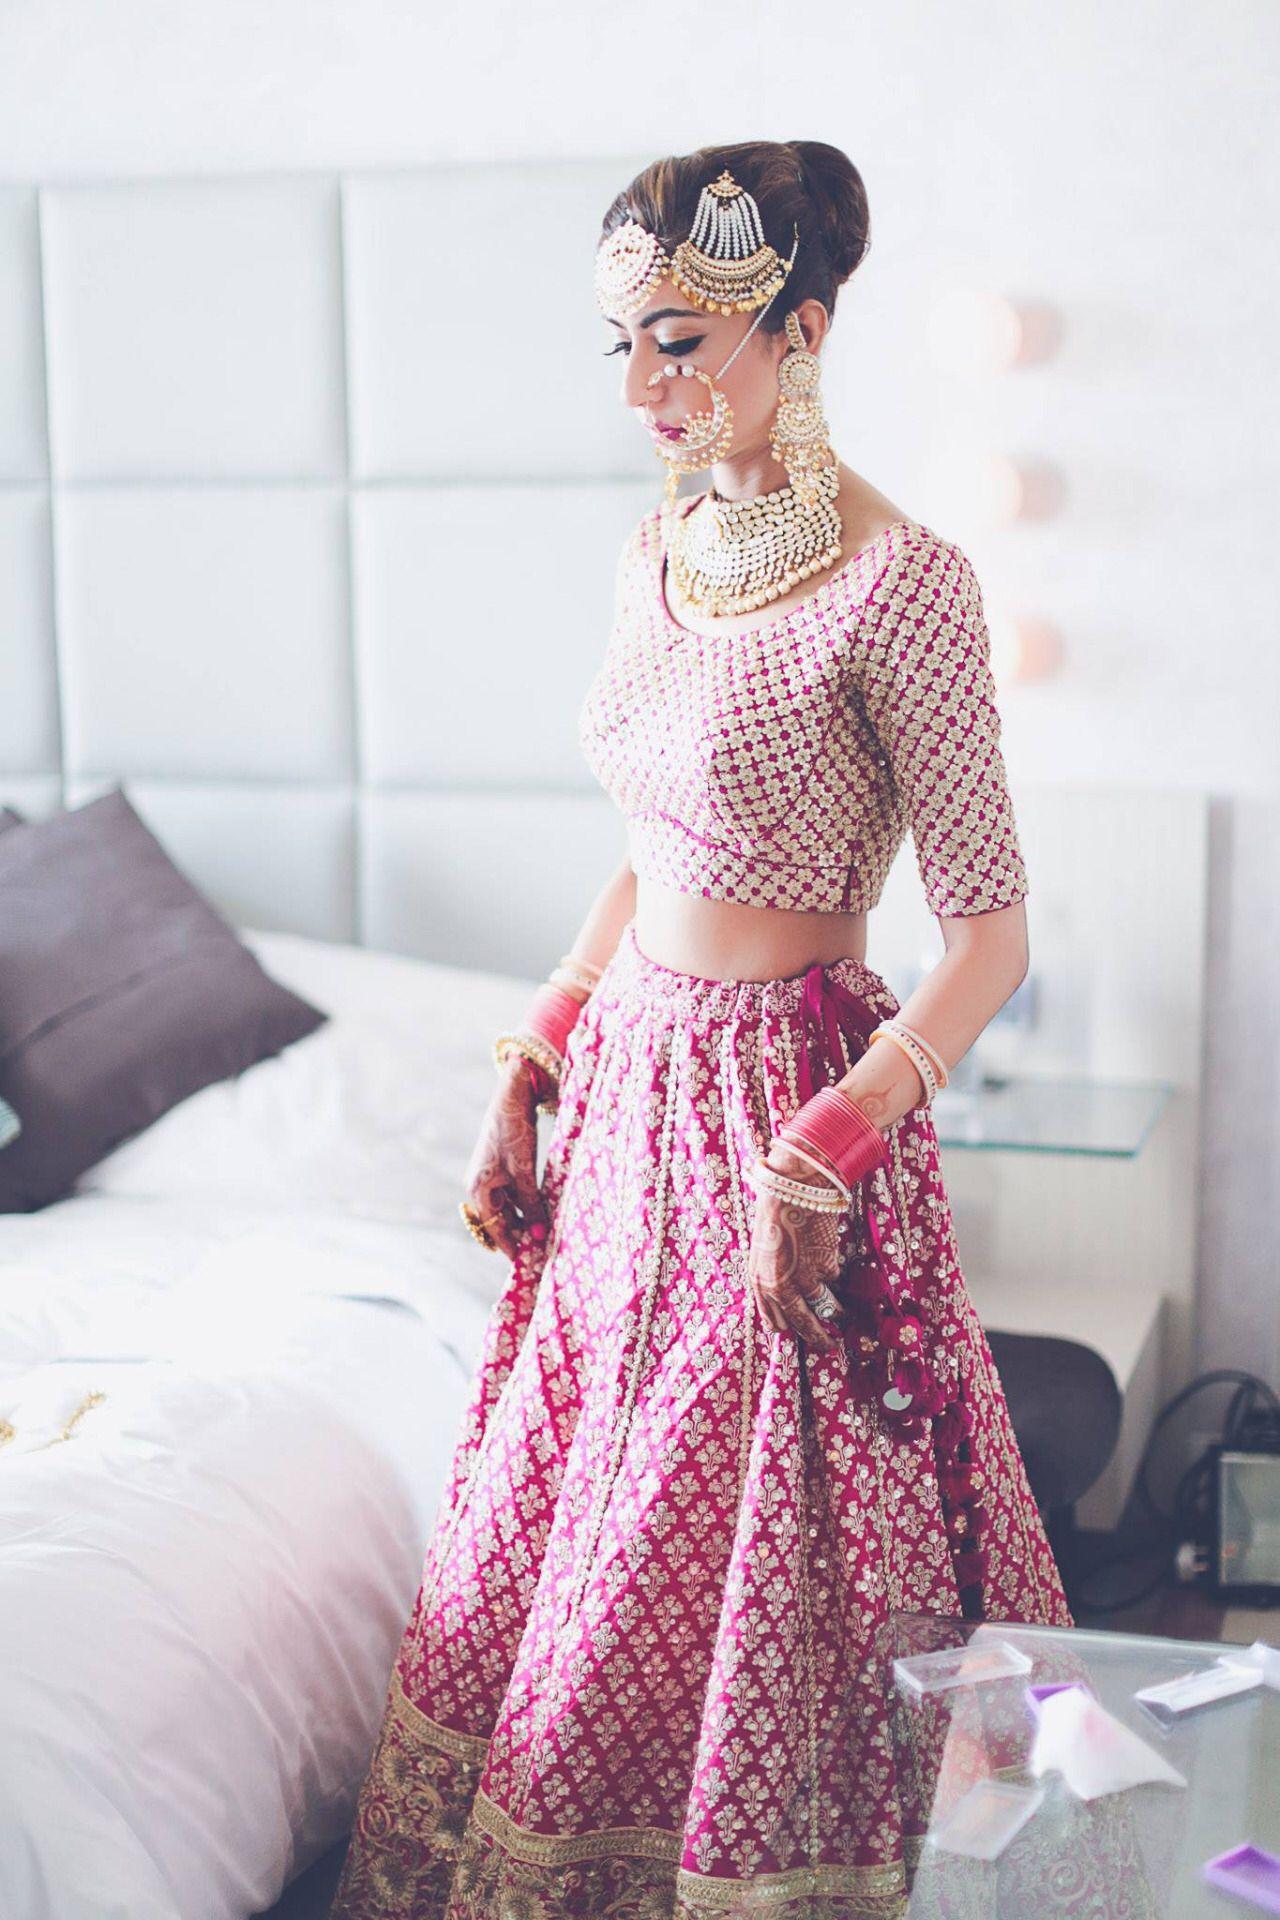 Pin de Rupa Tulachan en Indian outfits | Pinterest